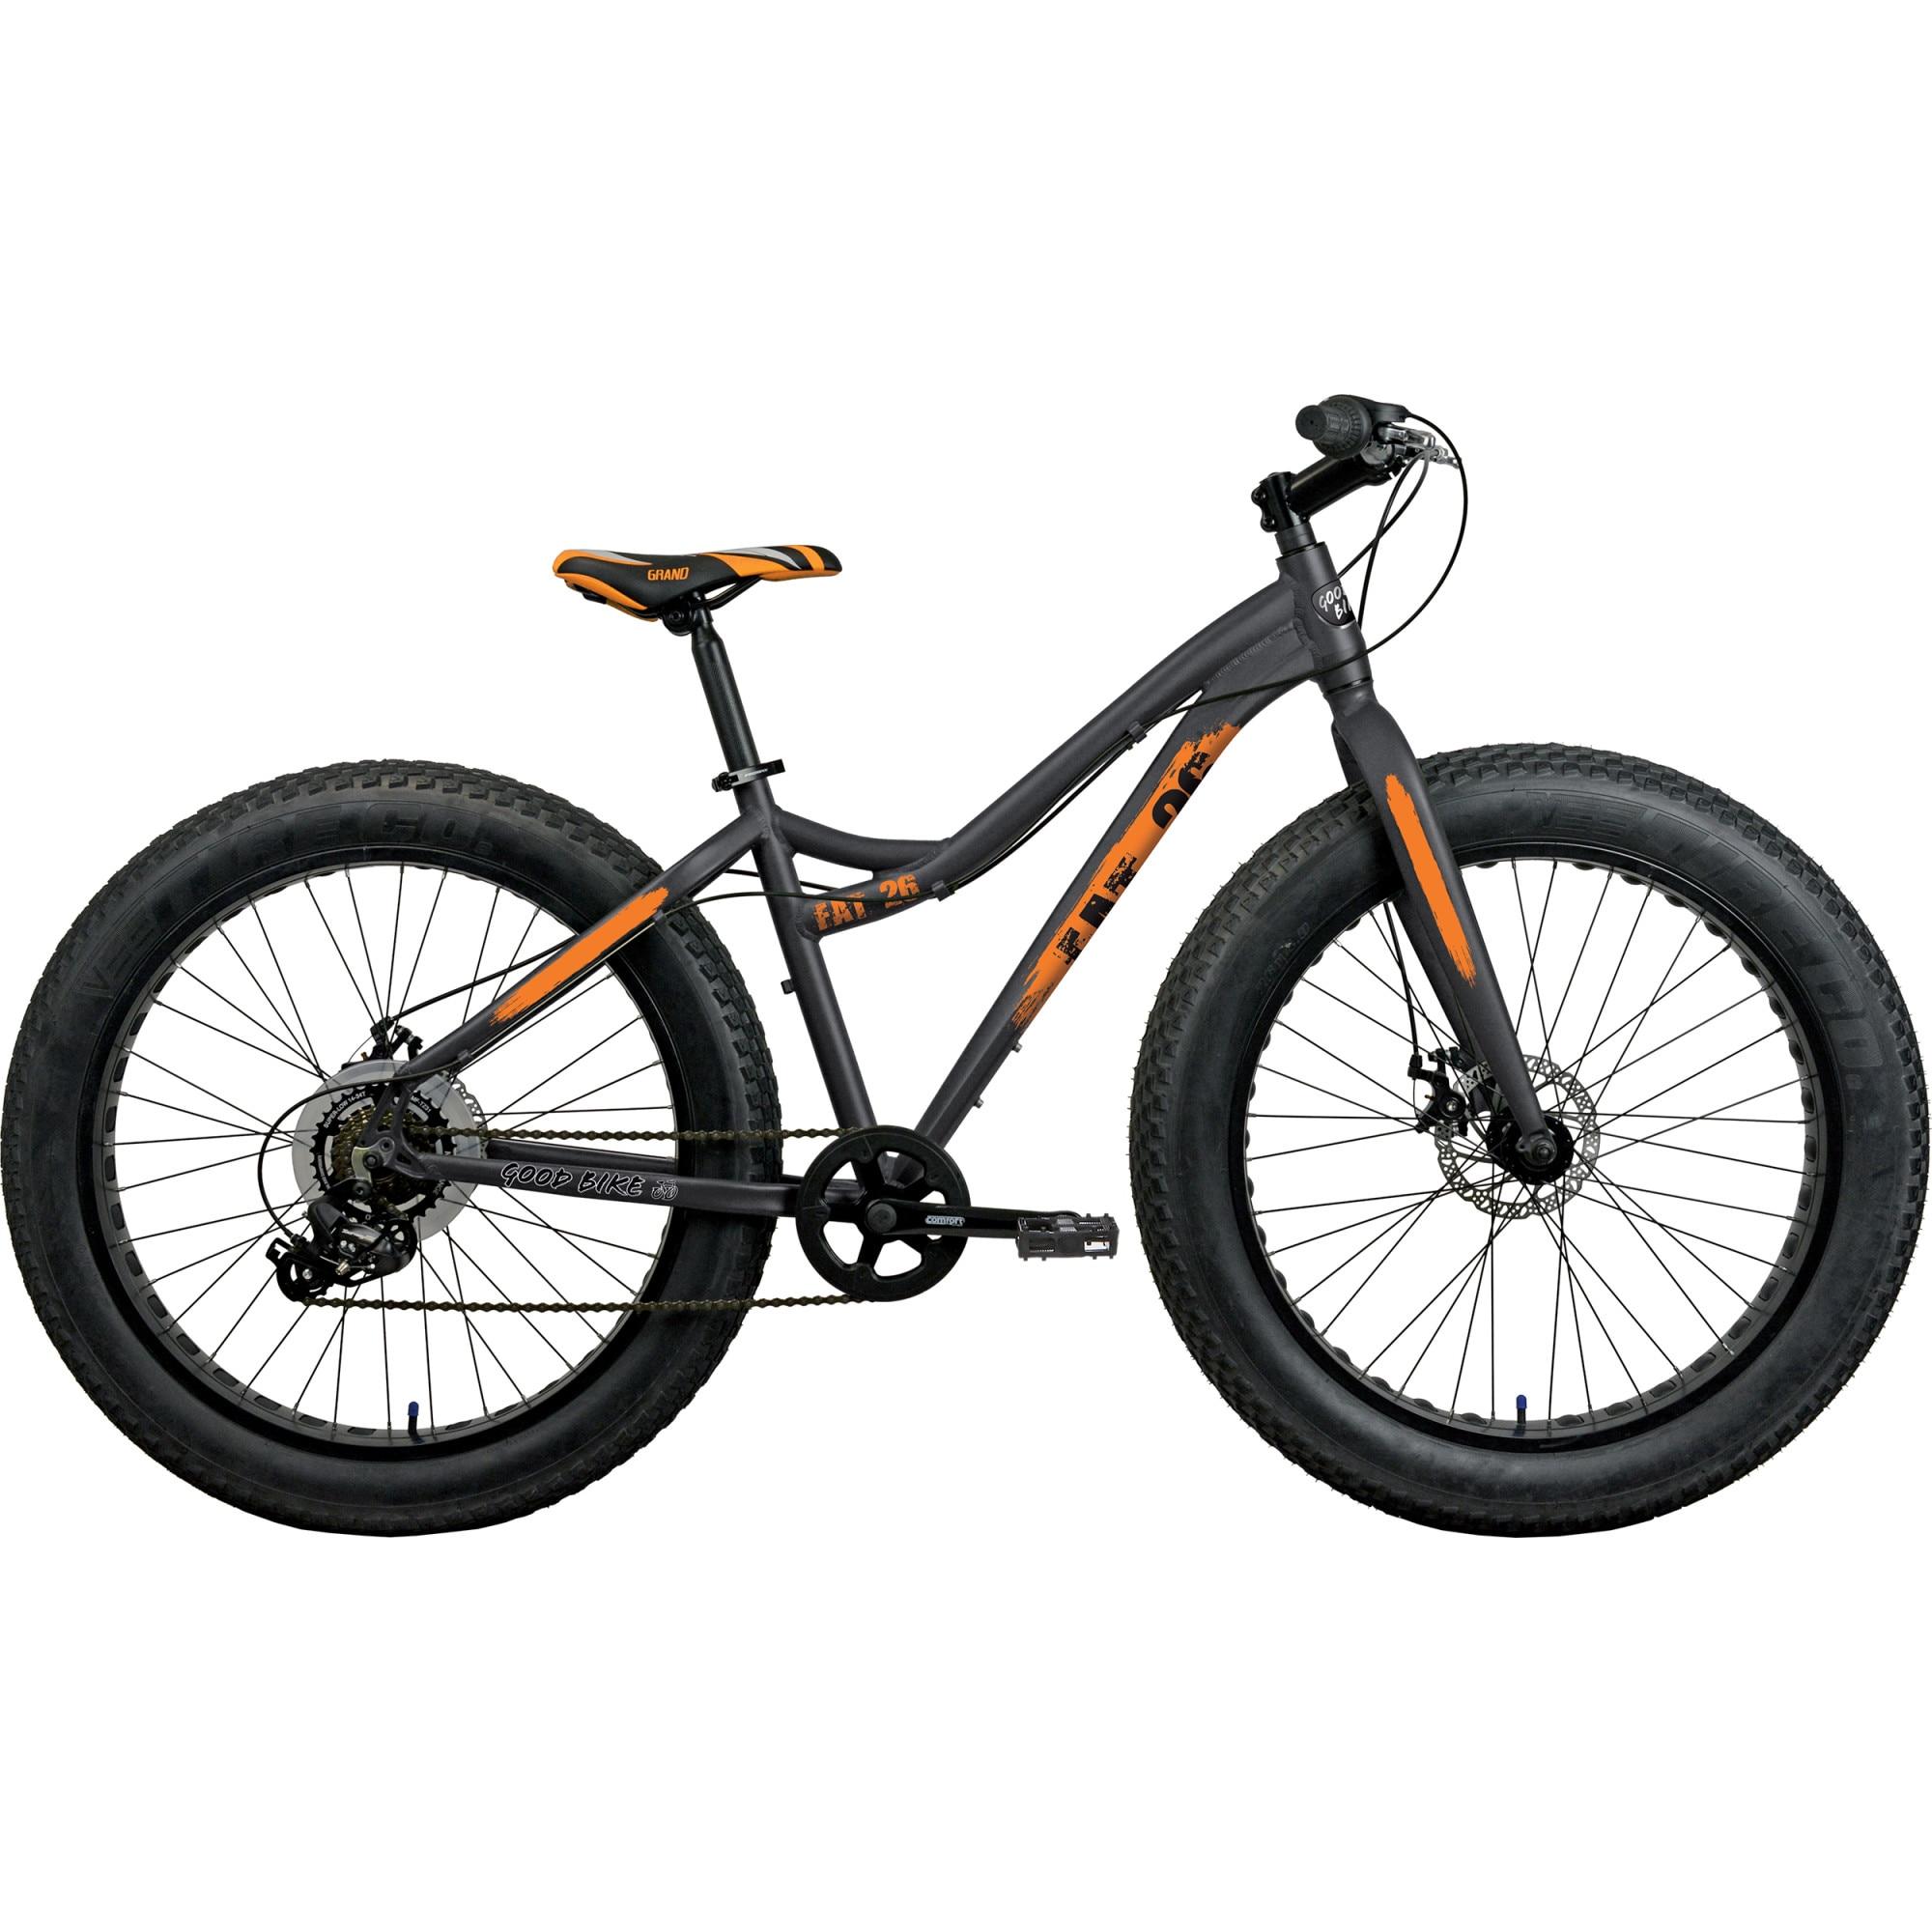 "Fotografie Fat Bike 26"" Good Bike Panzer, Black/Orange, 48cm"